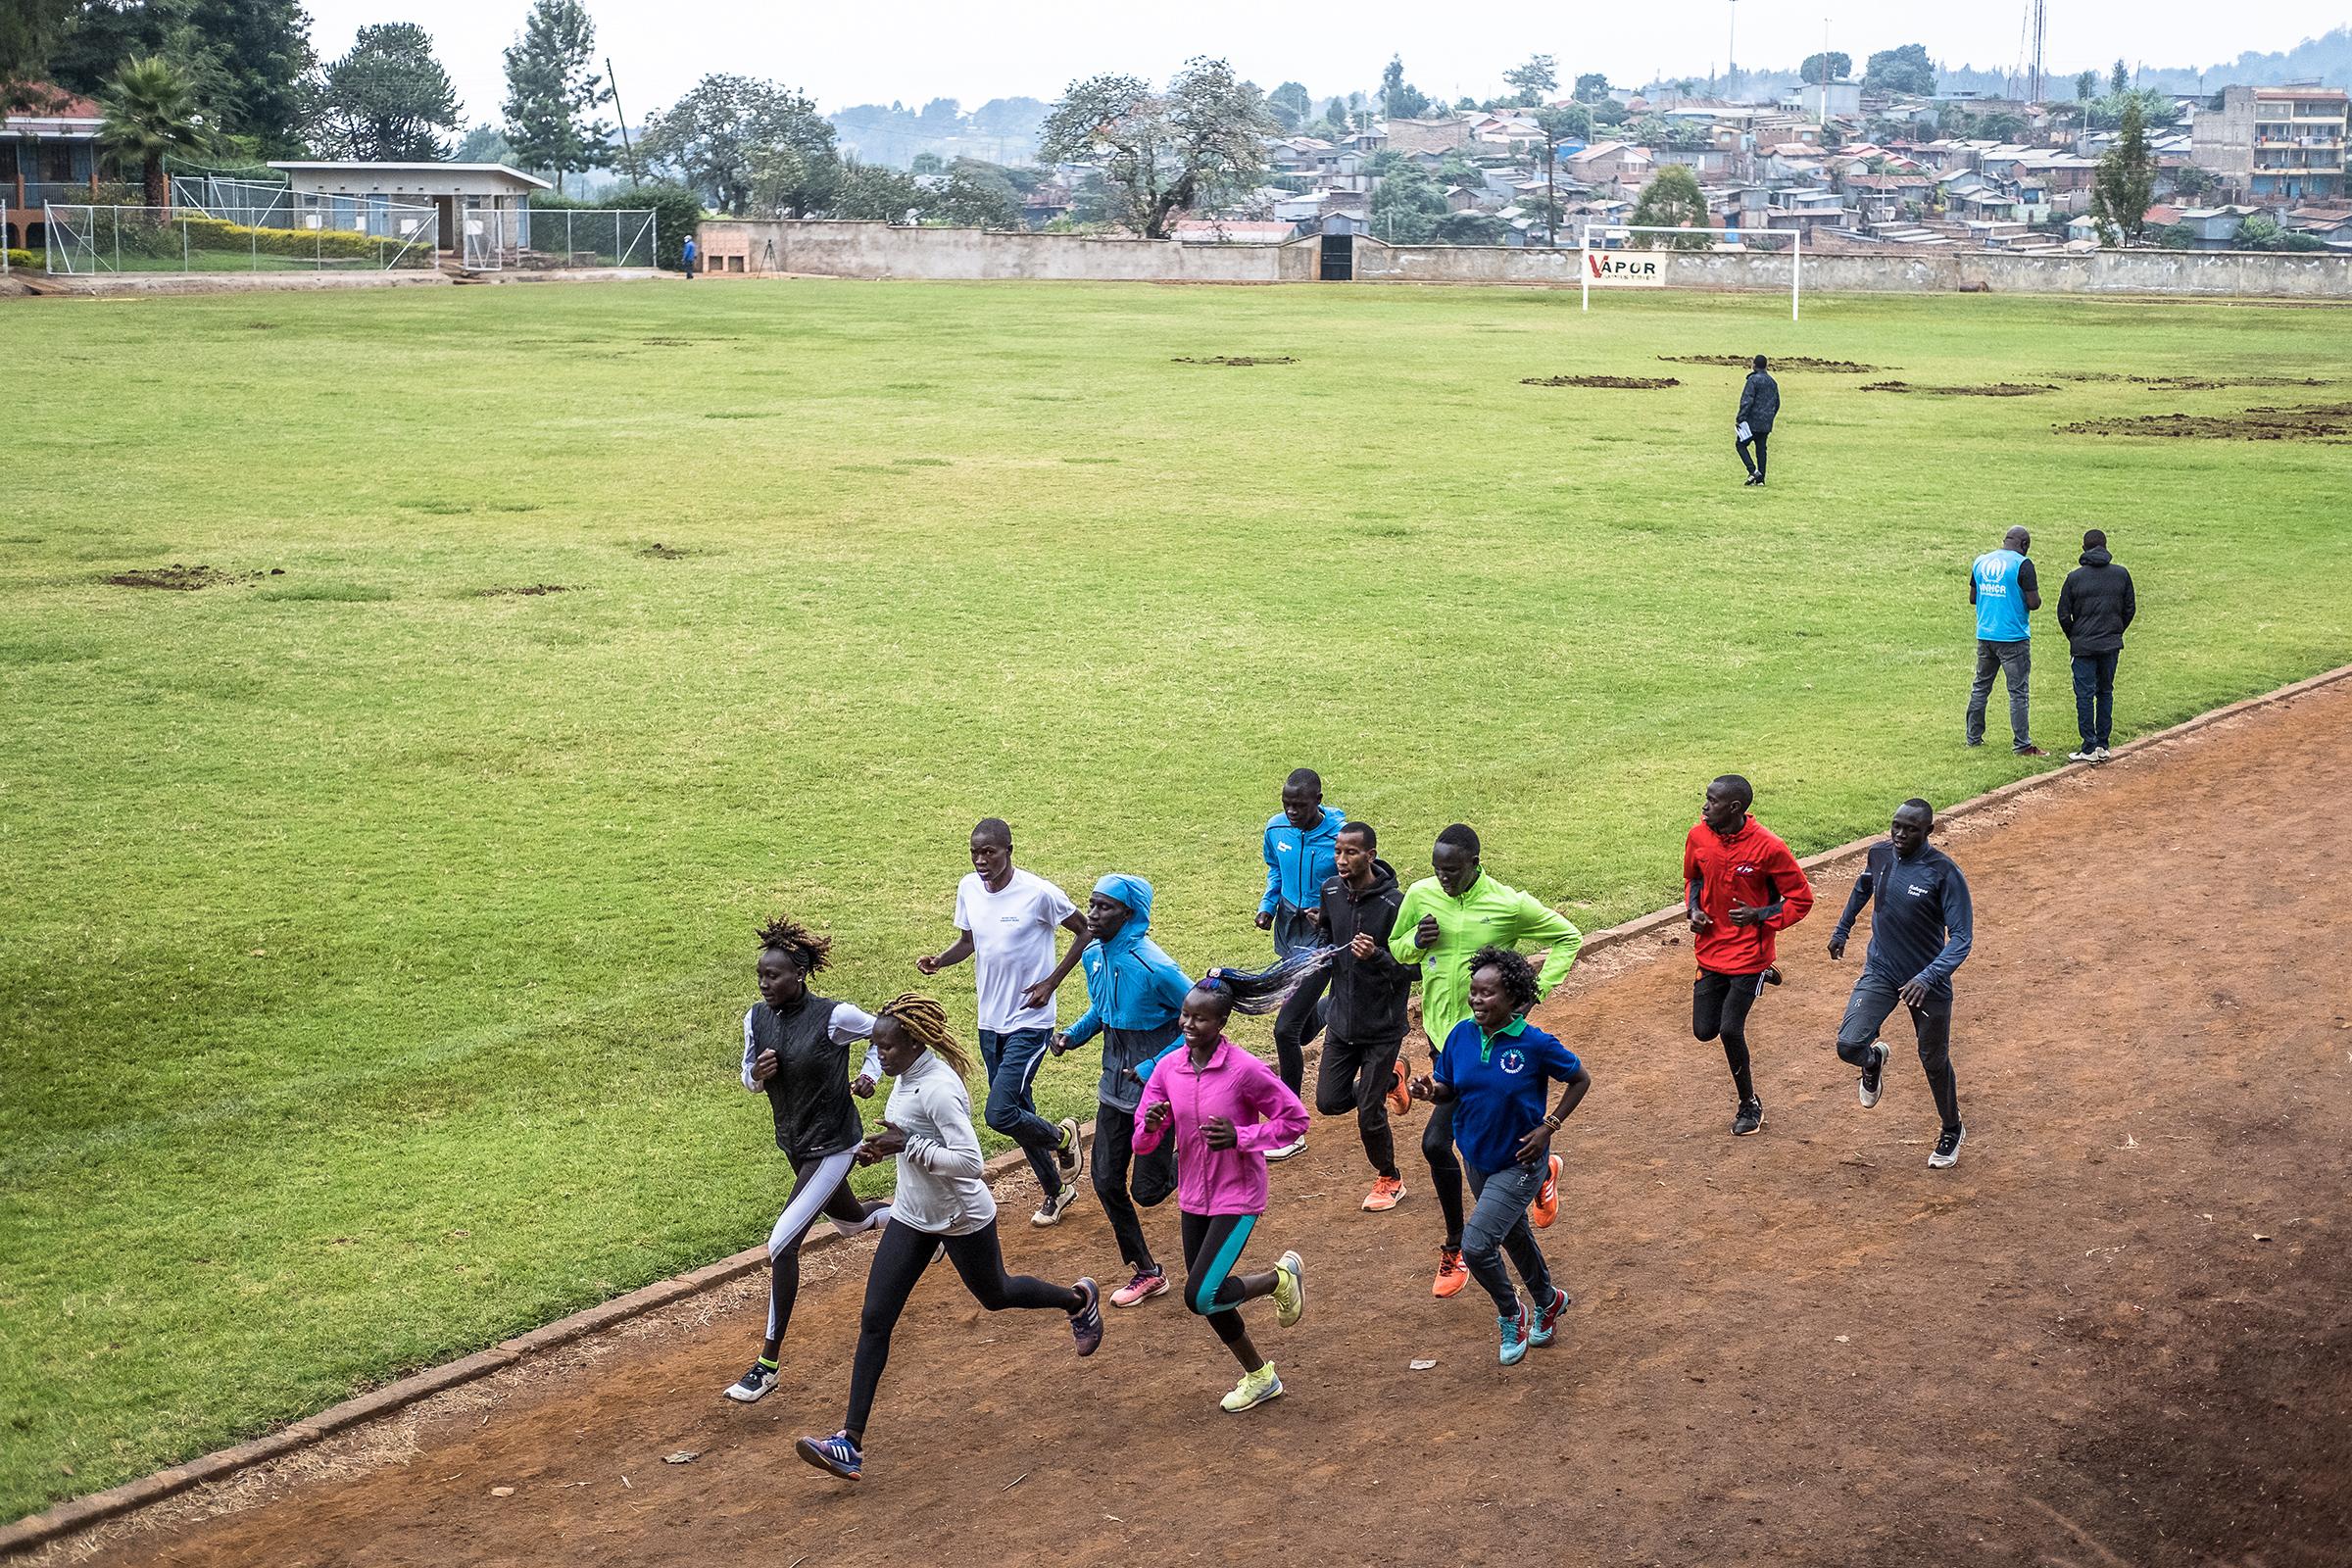 Refugee athletes run laps at the training camp in Ngong, Kenya.